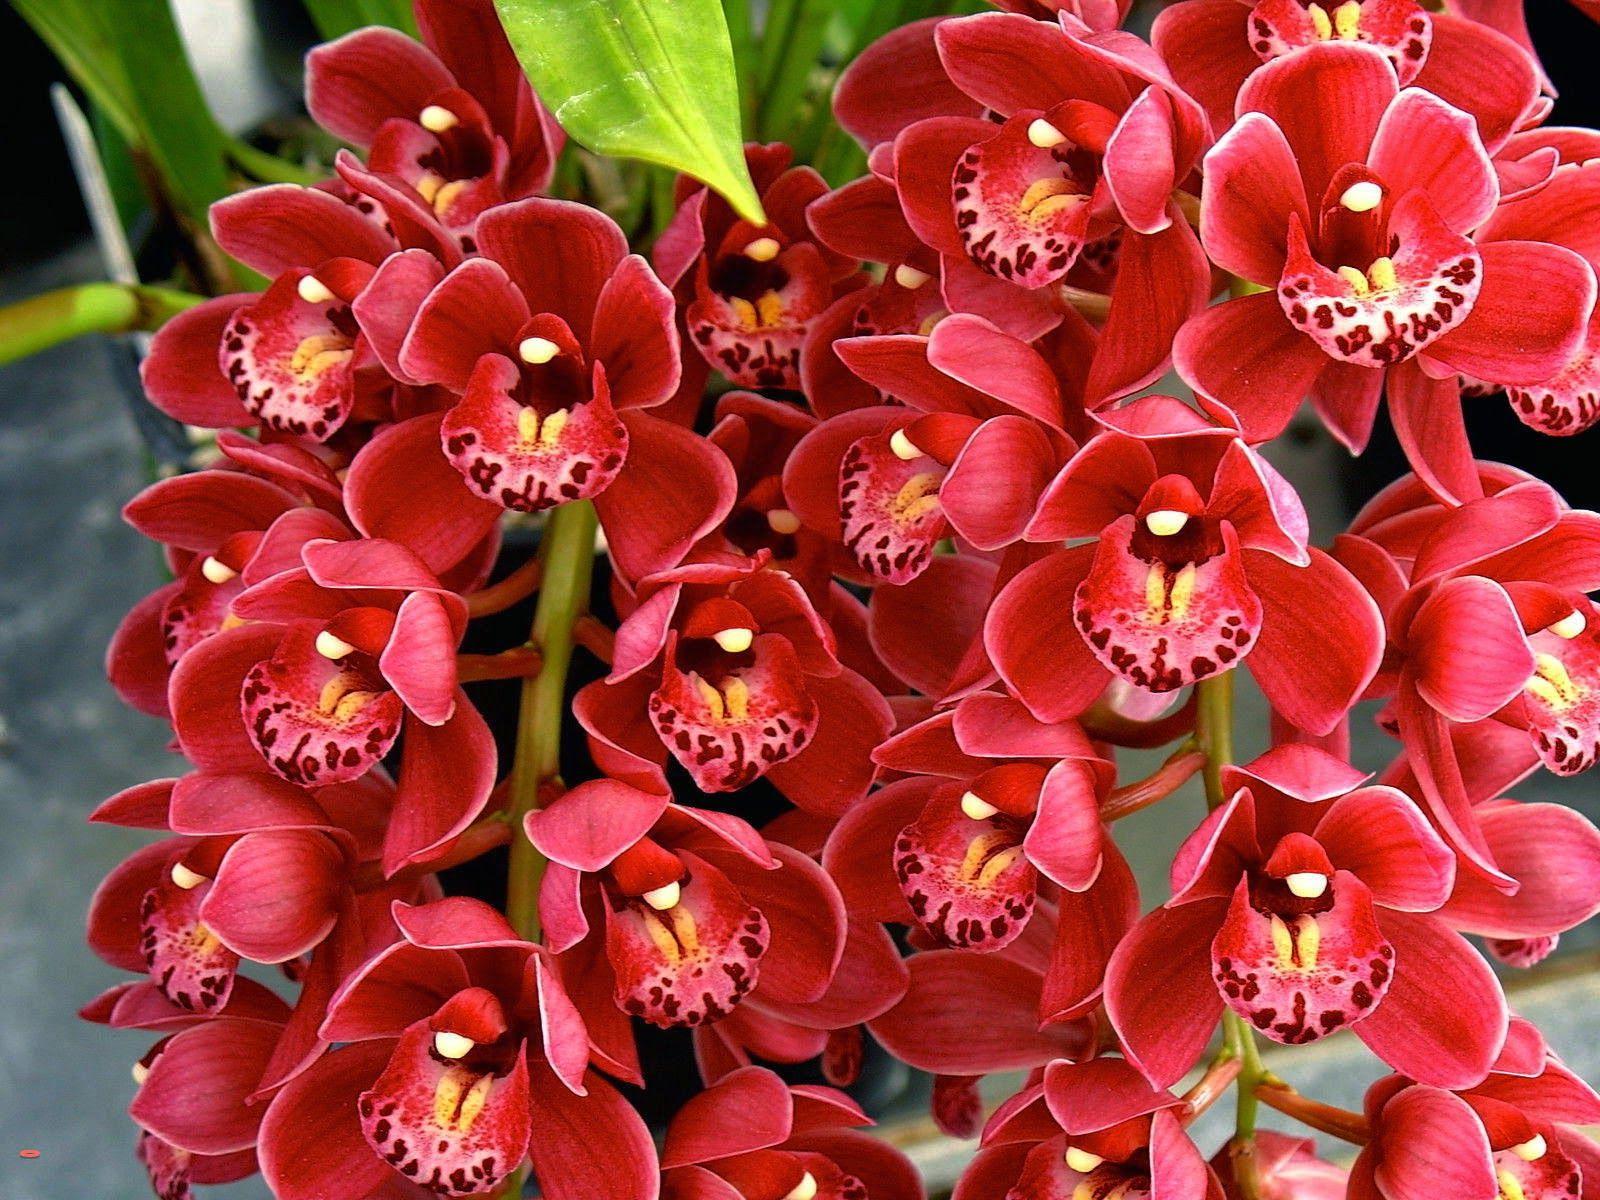 Cymbidium Orchids New Flowering Season Orchid Seeds Cymbidium Orchids Orchids